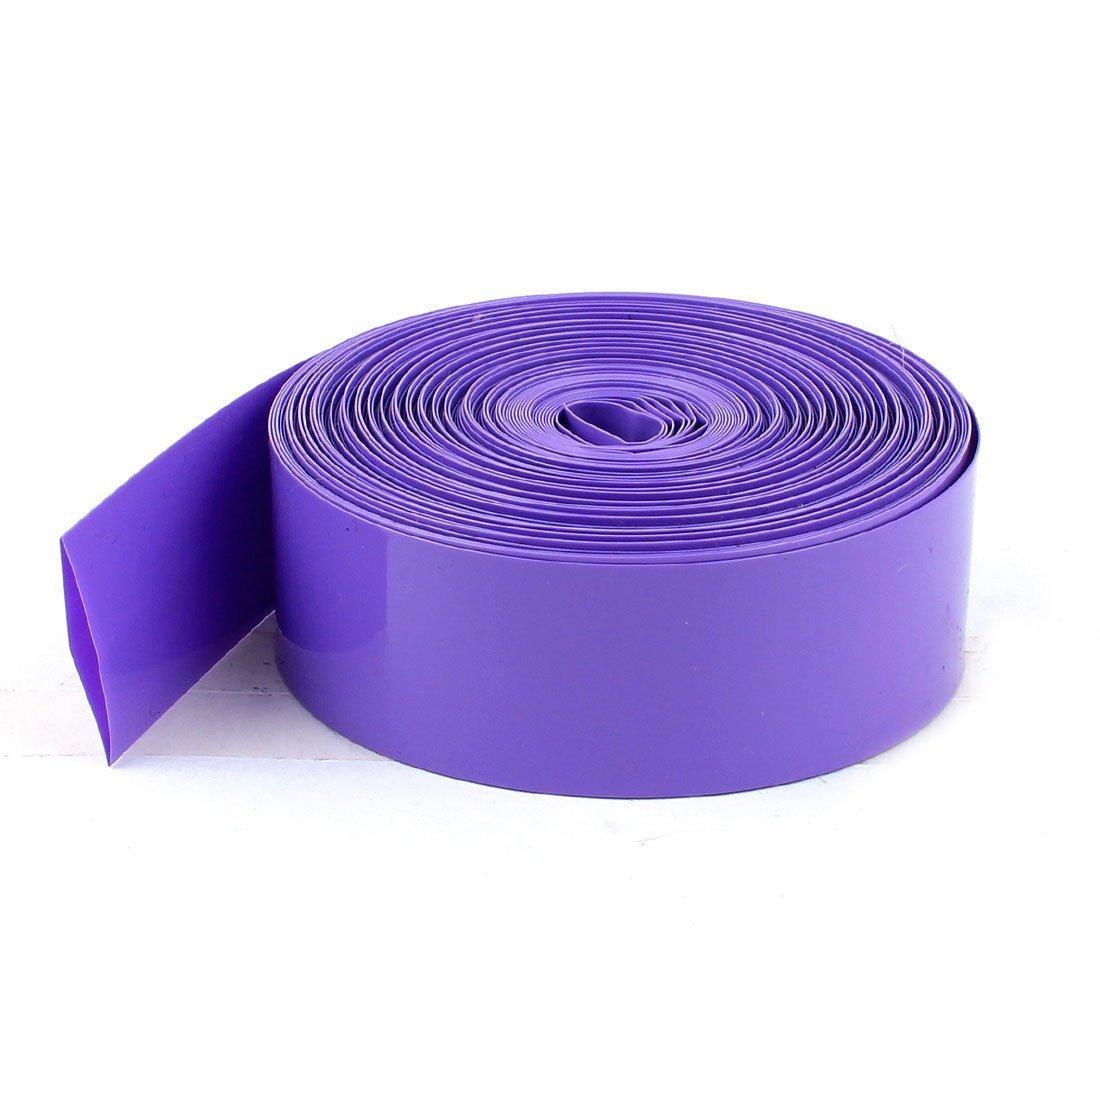 sourcingmap® 5m 16.4ft viola PVC termoretraibile avvolgere tubo cavo 23mm larghezza per 1xAA batteria sourcing map a15012300ux0257